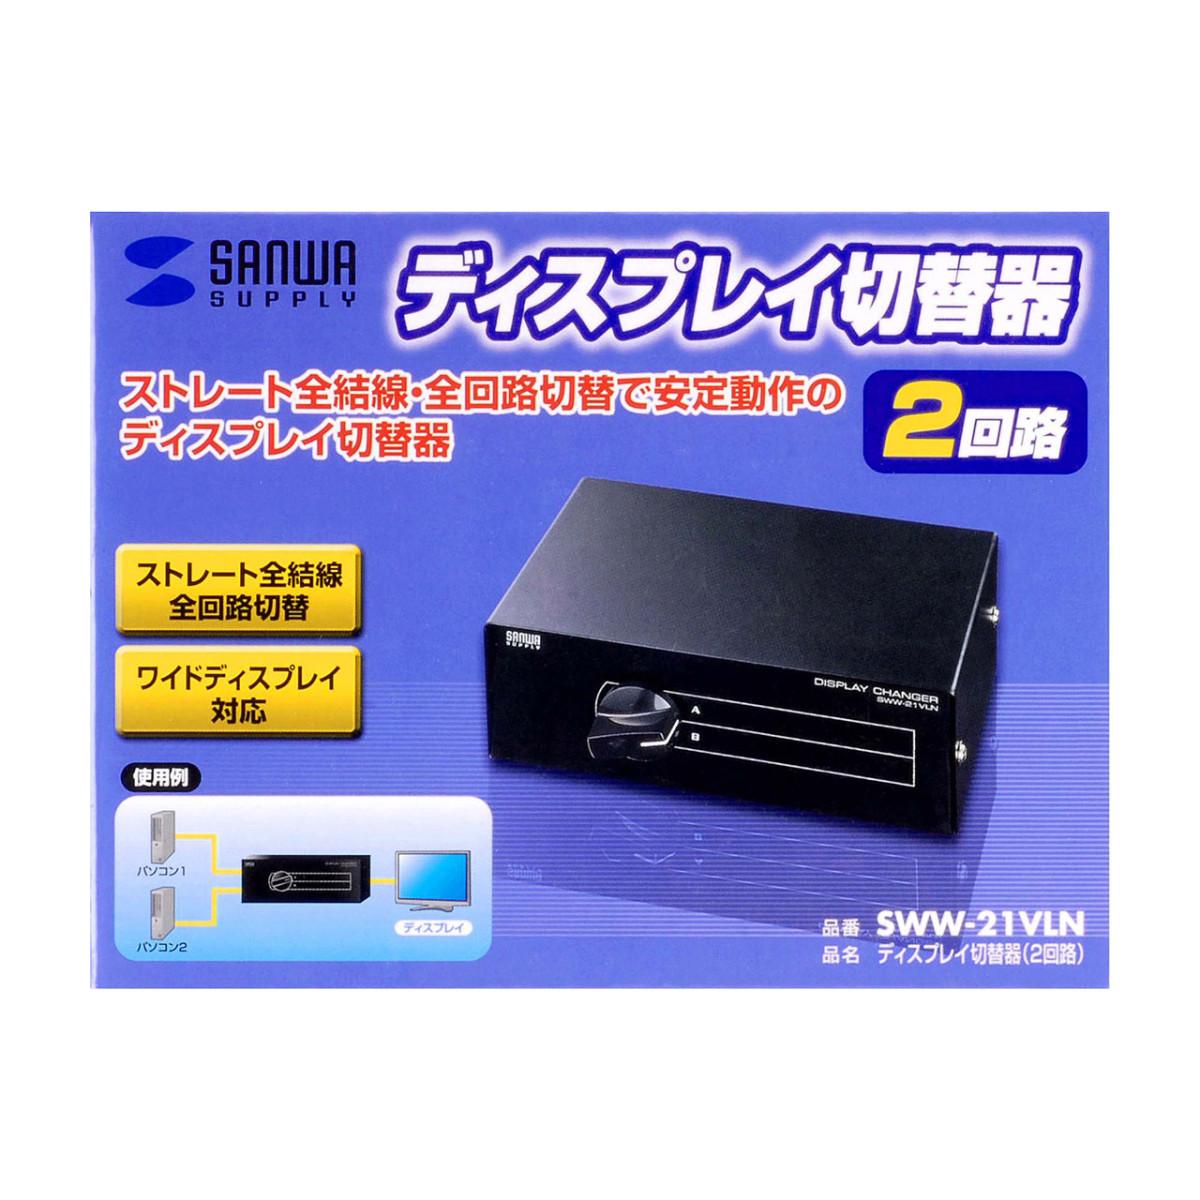 [SWW-21VLN] ディスプレイ切替器(2回路)